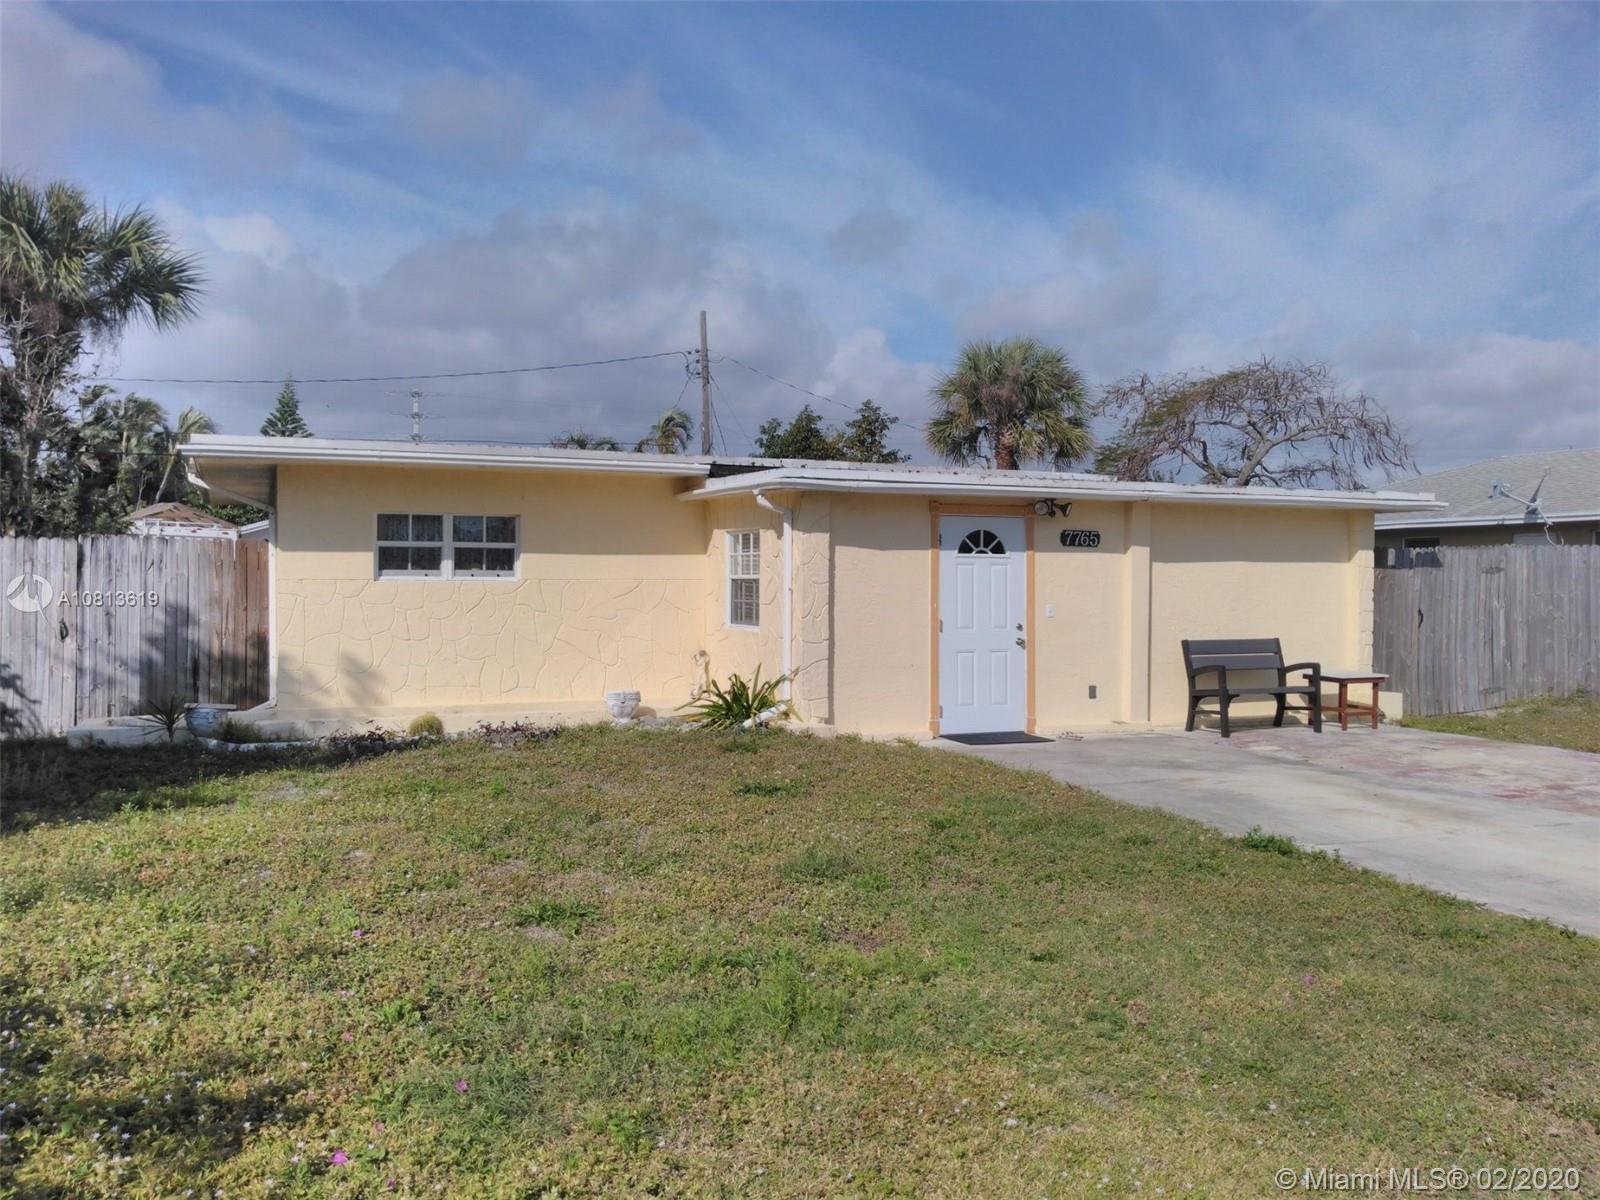 7765 Griswold St, Lake Worth, FL 33462 - Lake Worth, FL real estate listing